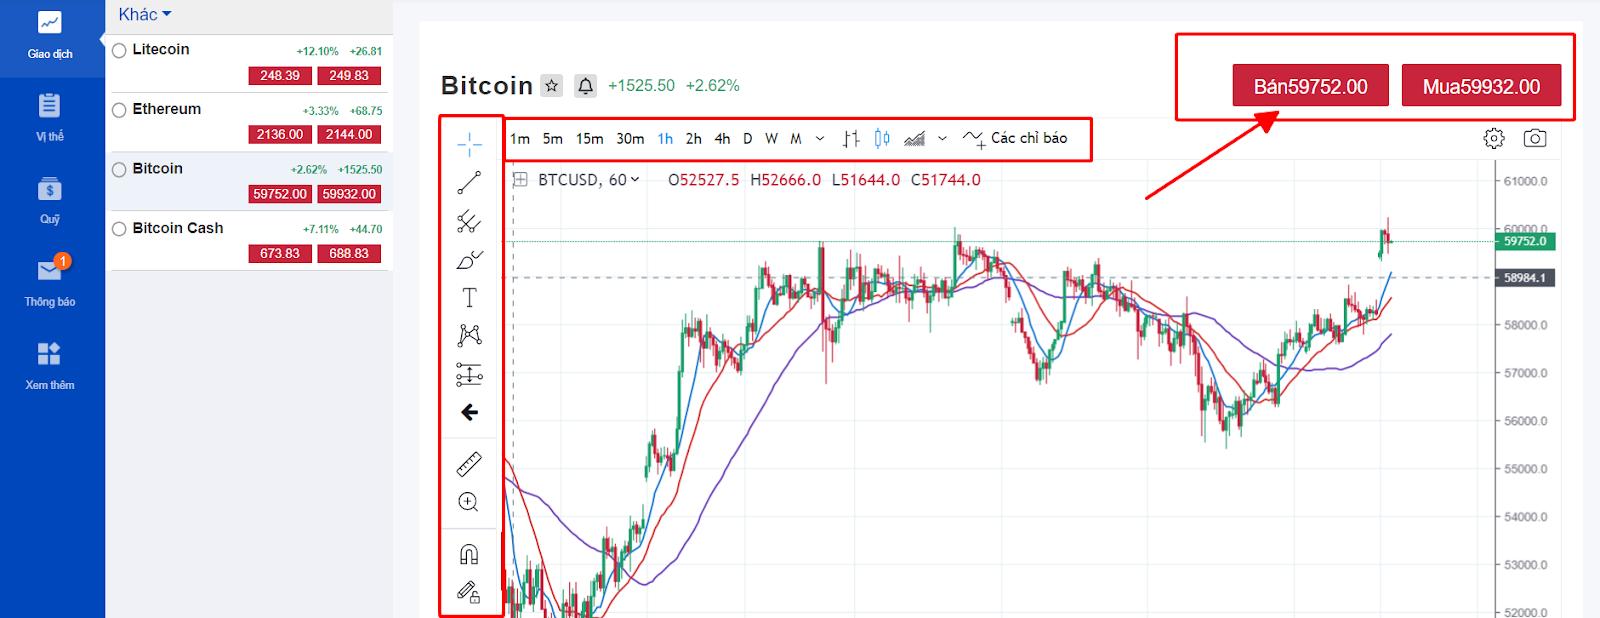 mua bán Bitcoin trên Mitrade